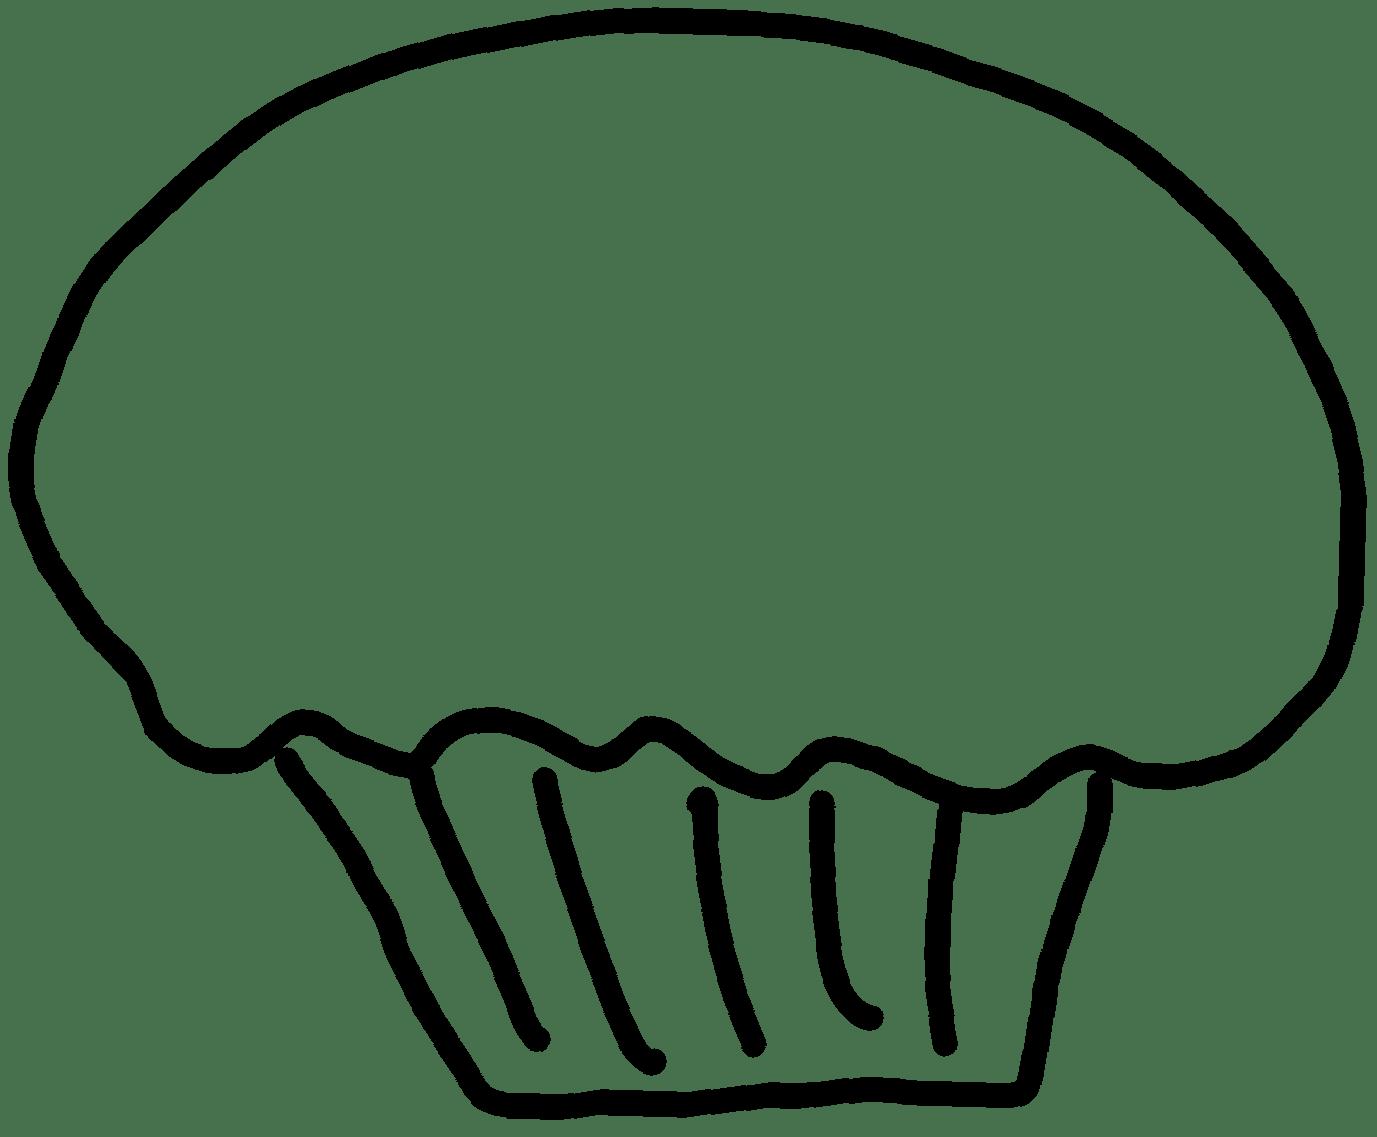 black white cupcake clipart